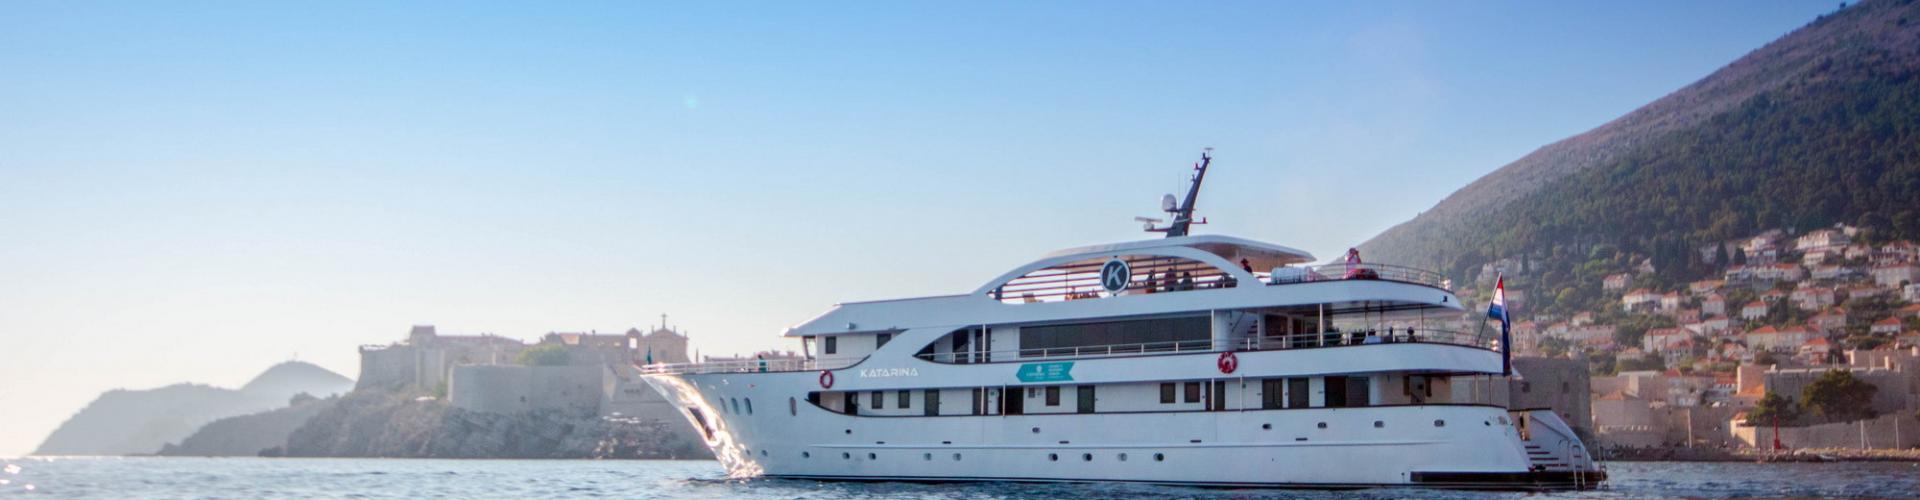 2019. Deluxe cruiser MV Katarina